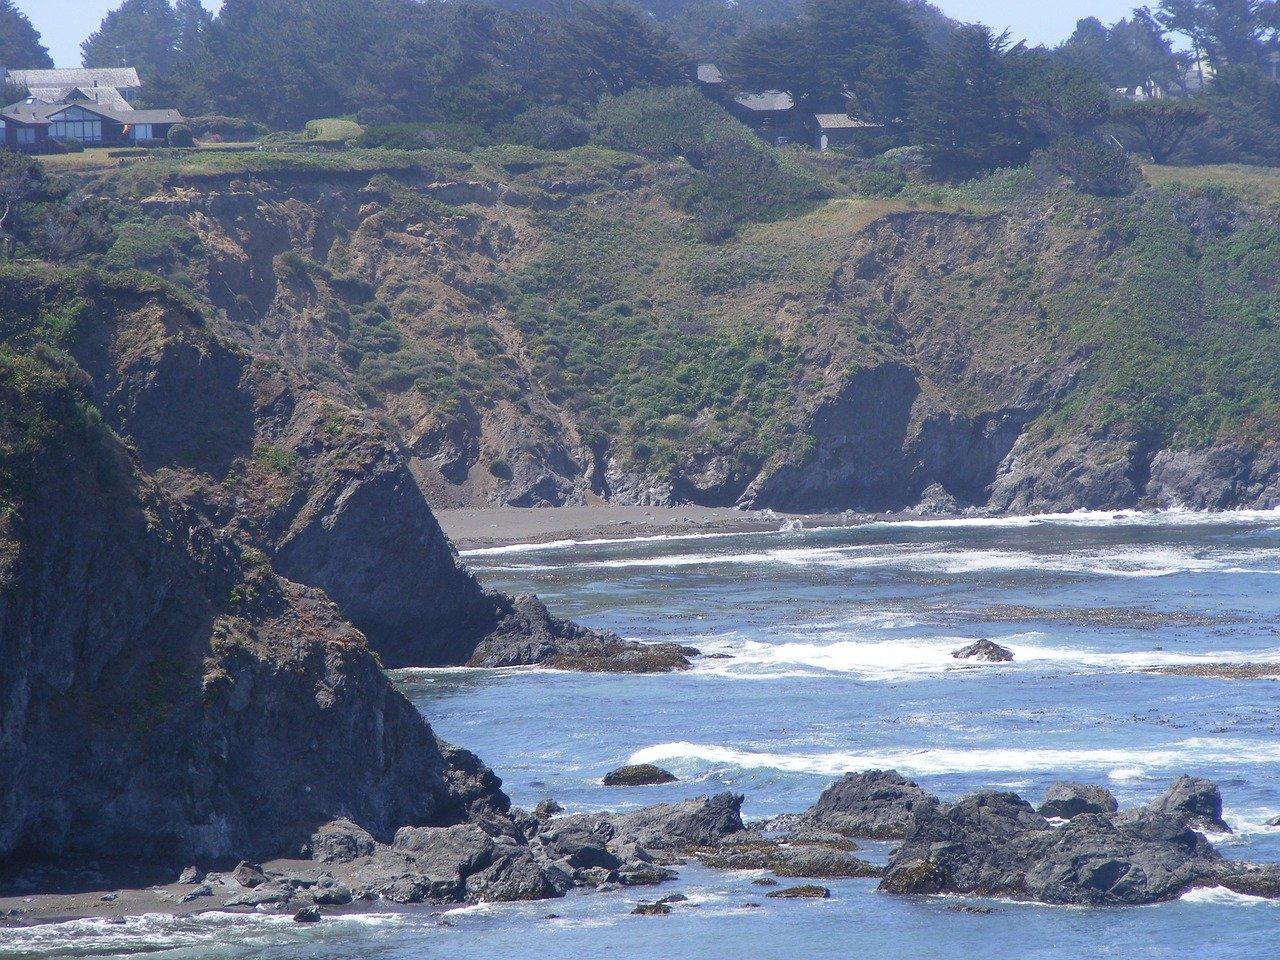 Mendocino Coast - Beautiful Weekend Getaway From San Francisco